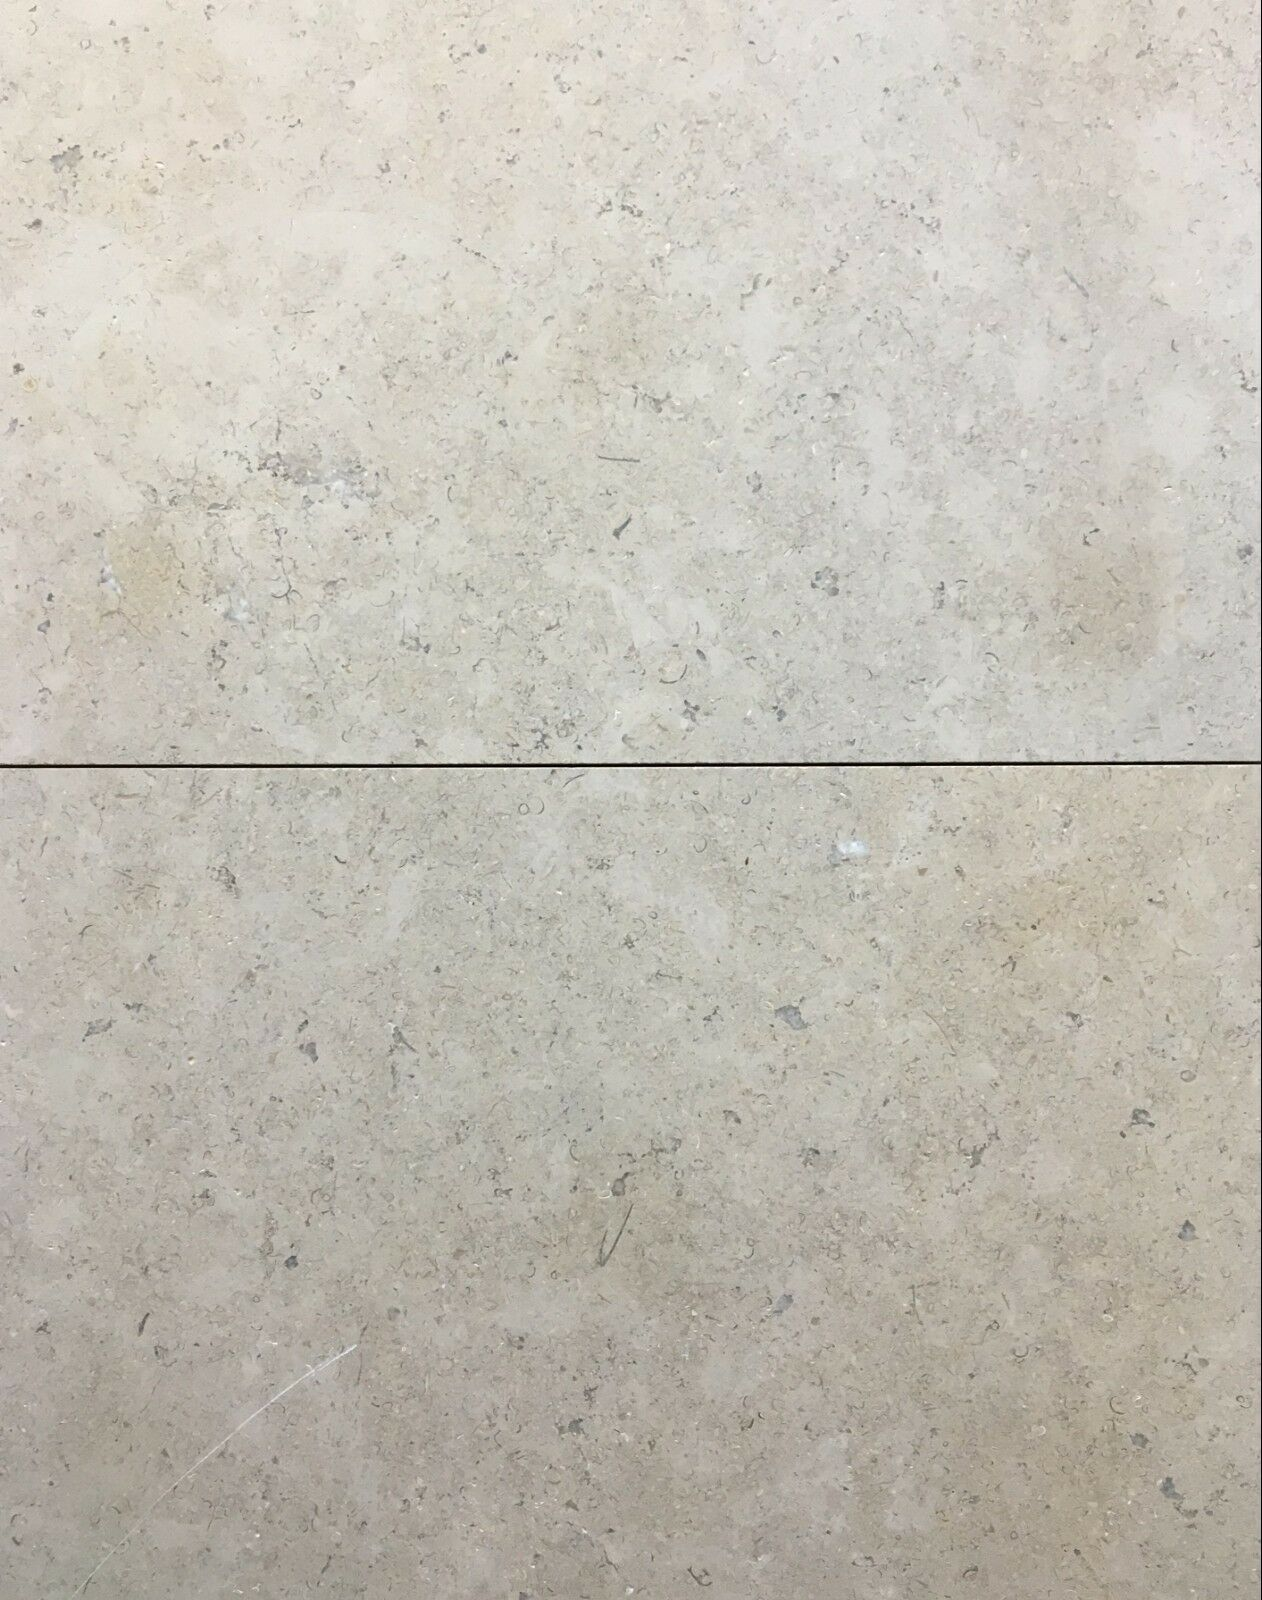 DIJON TUMBLED EDGE LIMESTONE TILES OPUS PATTERN x15mm  PER SQM